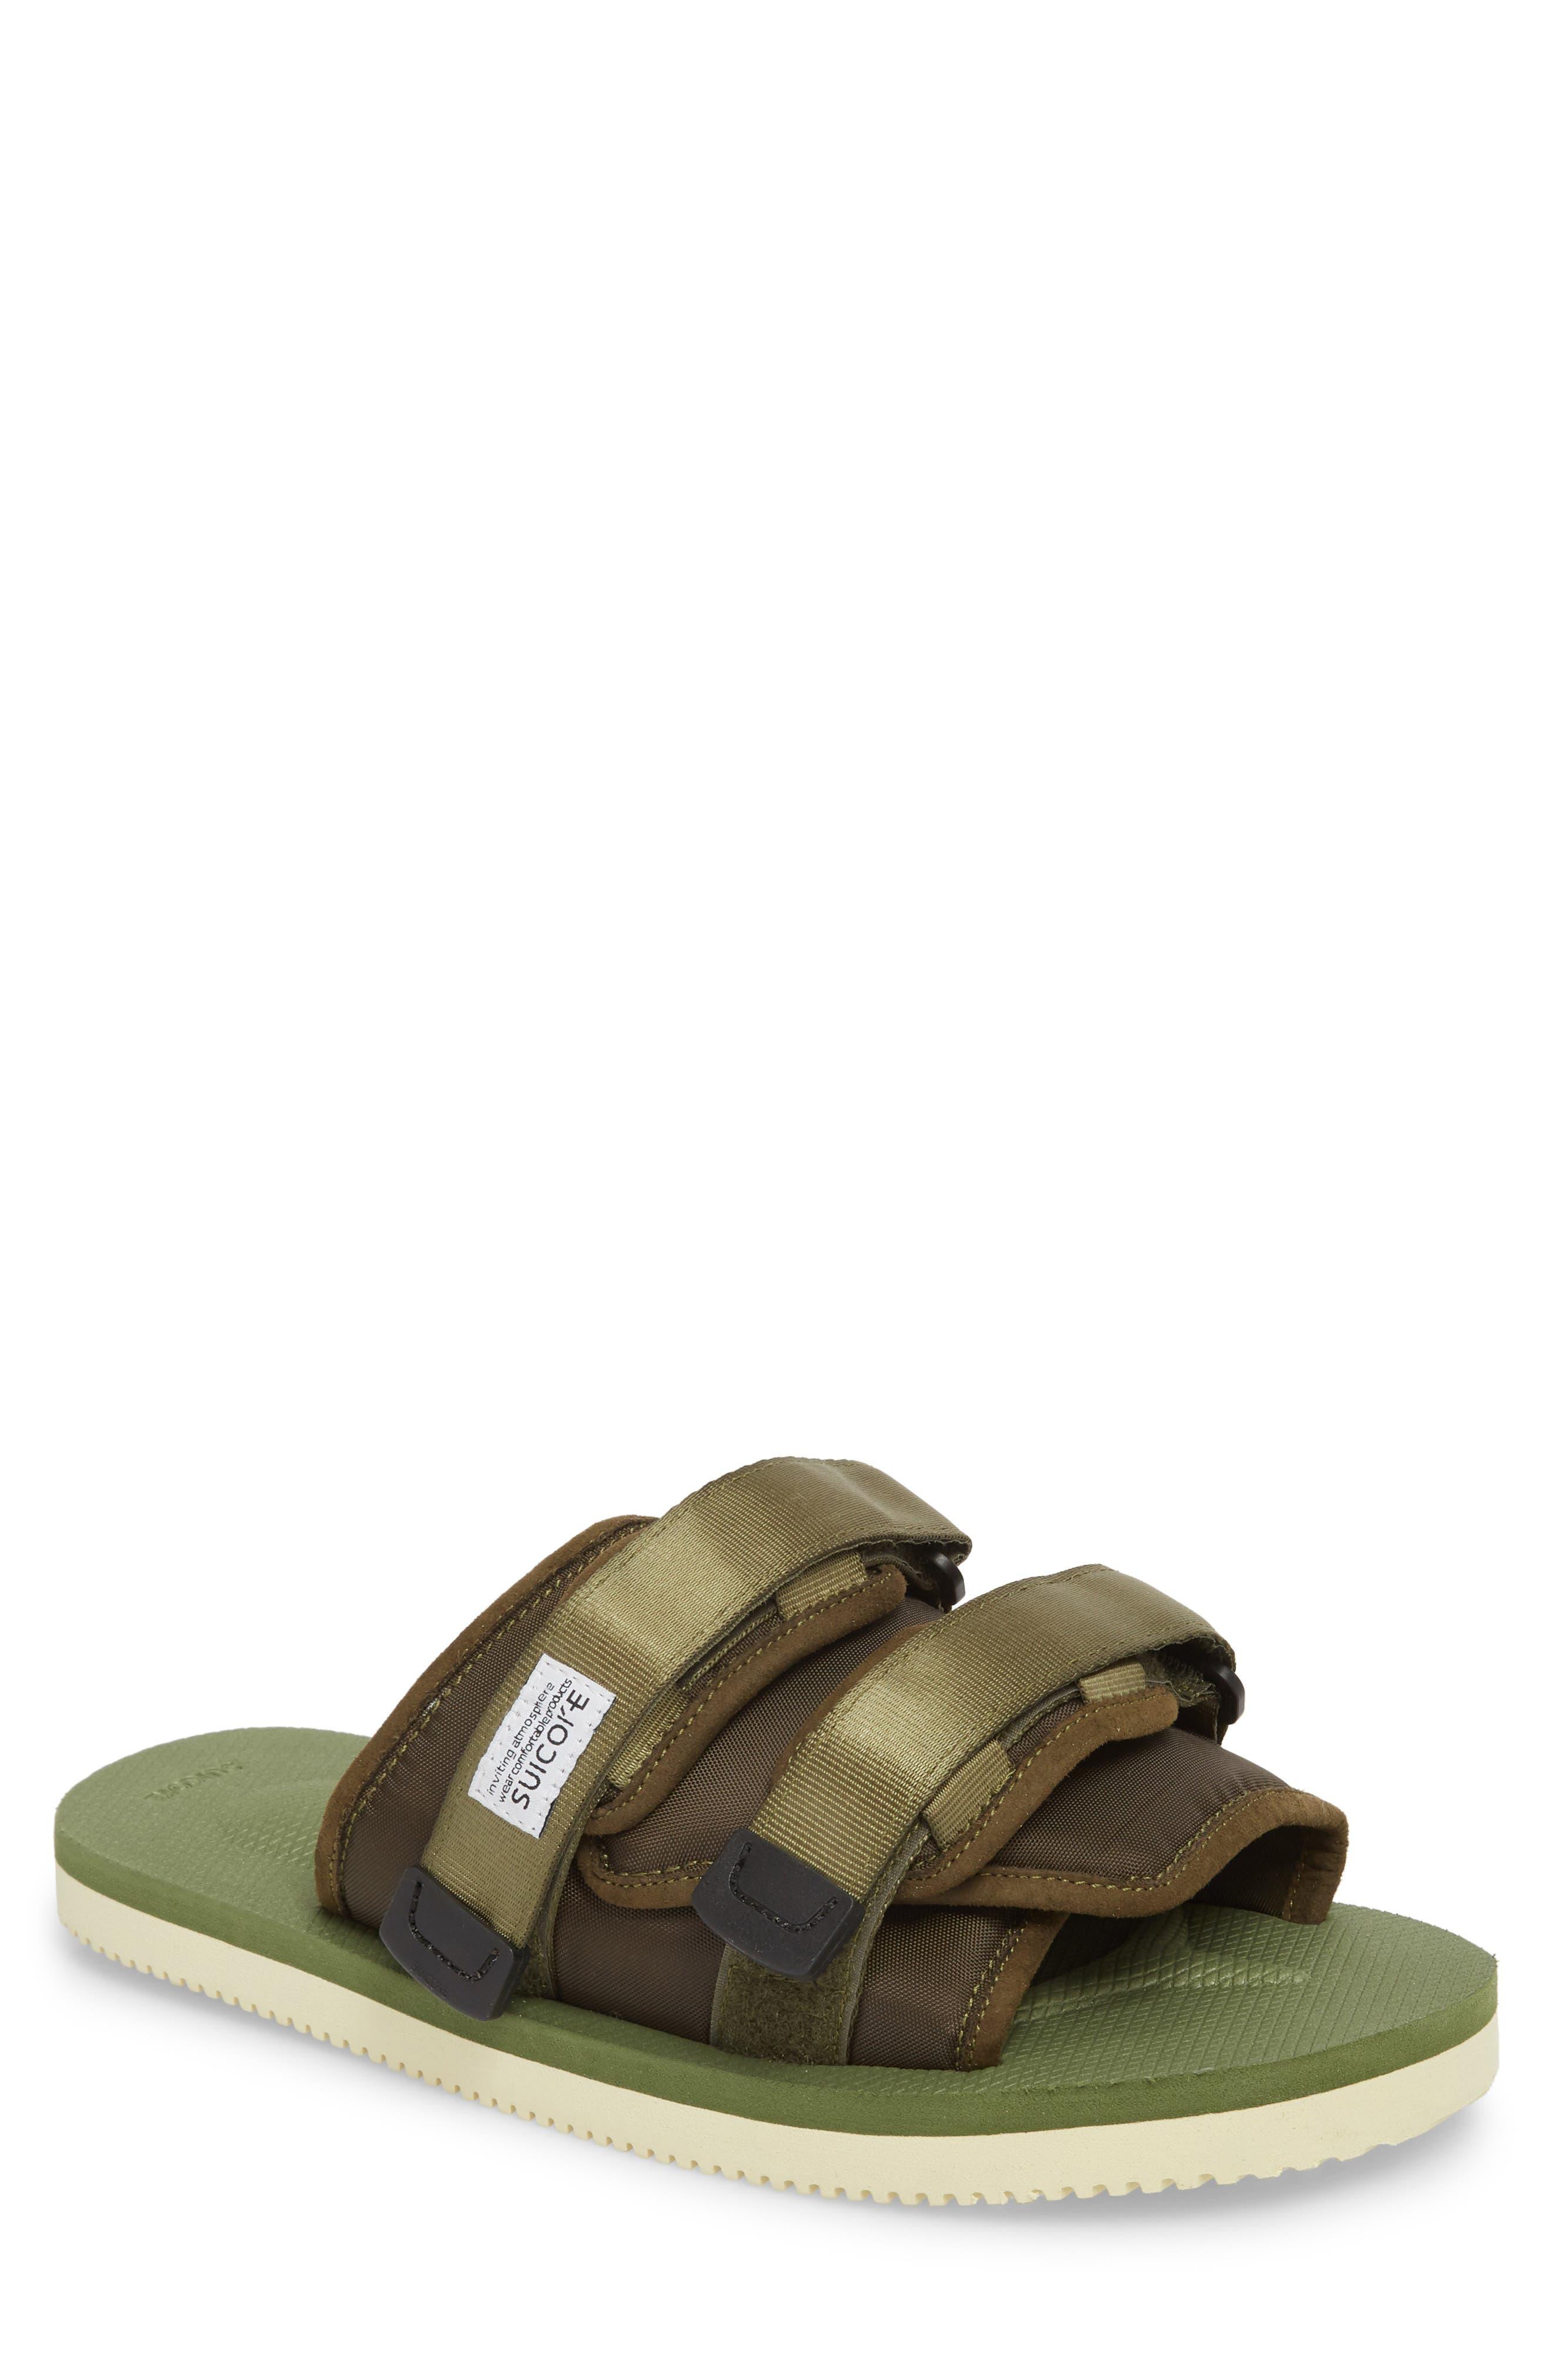 58915e196623 1 Deal Suicoke Moto Cab Slide Sandal (Men) on best store